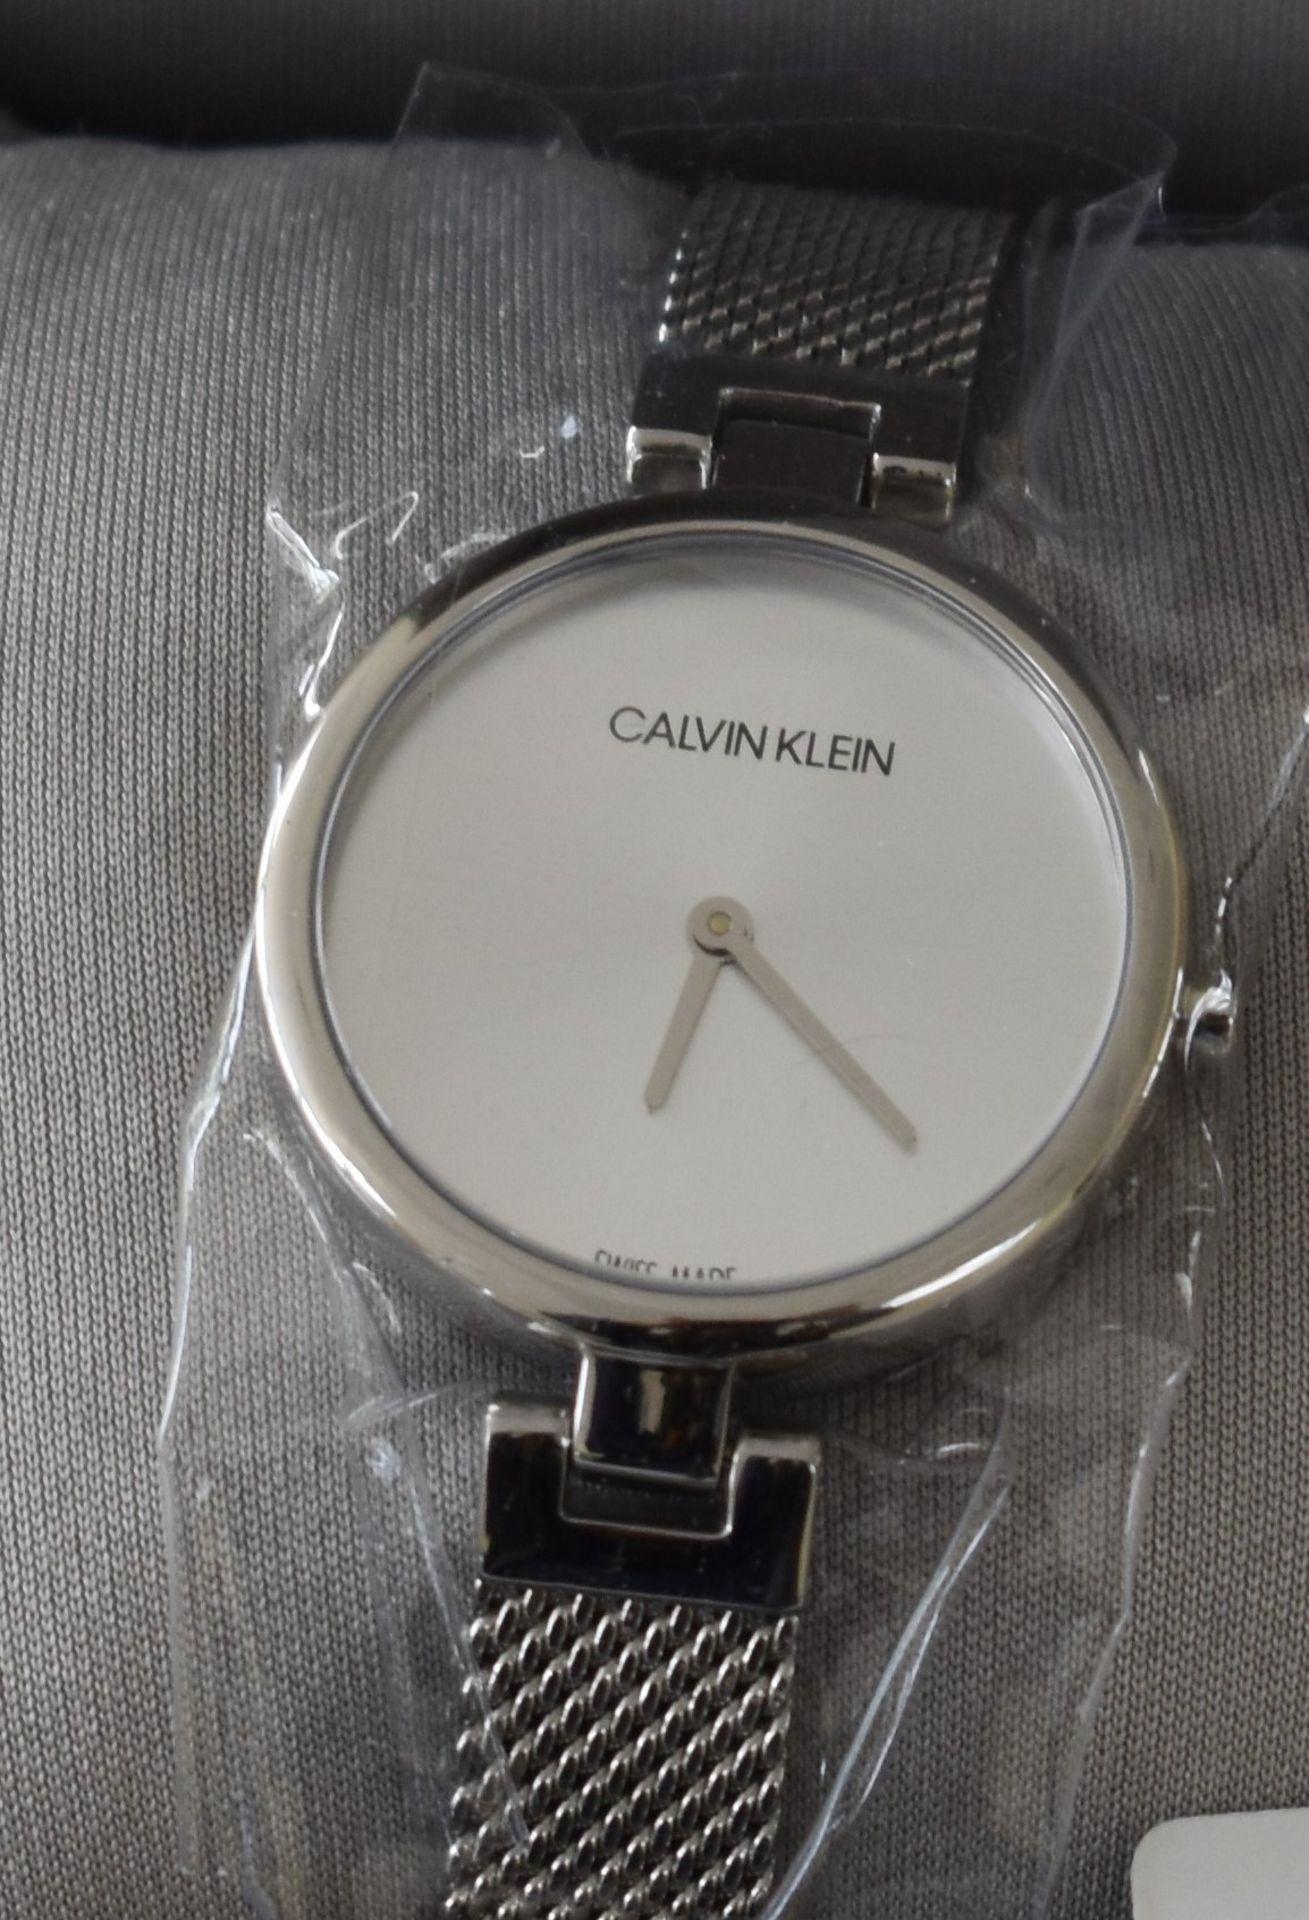 Calvin klein K8G23126 Ladies watch - Image 2 of 2